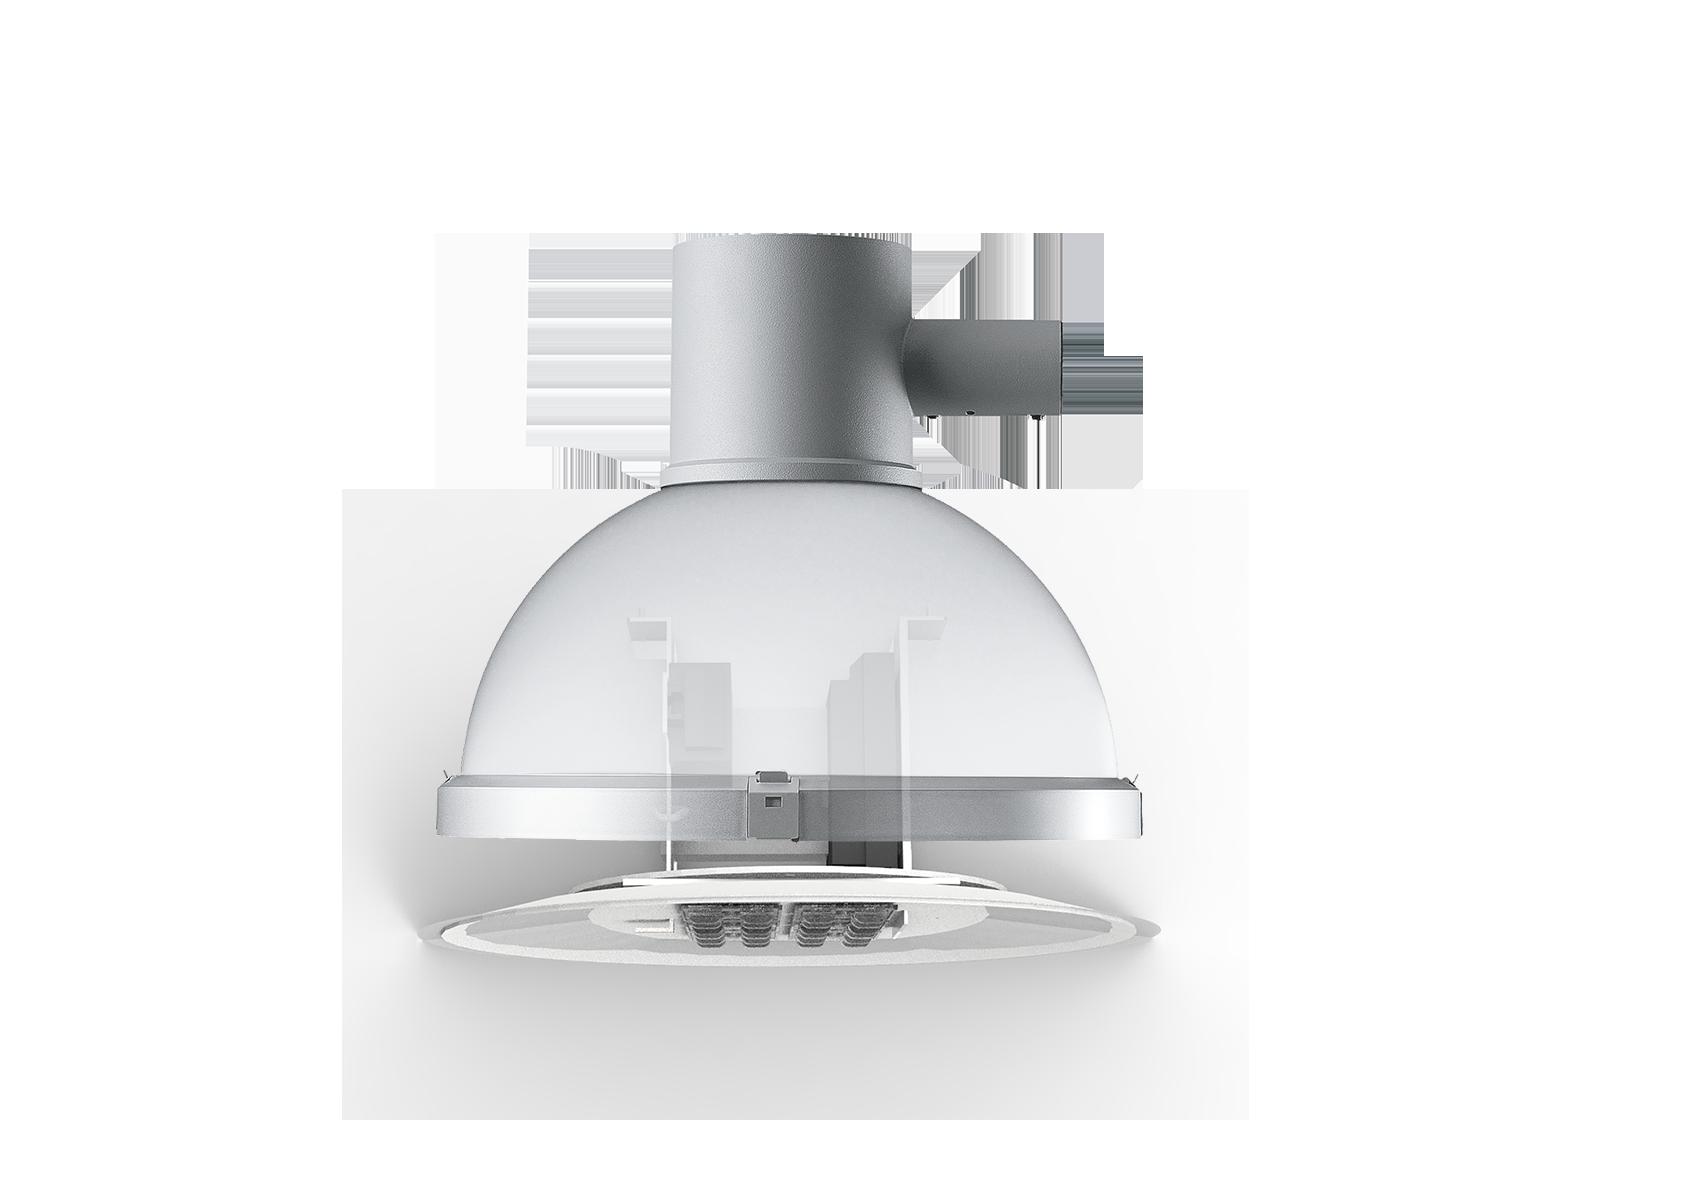 LED indsats Fortimo FastFlex Gen4 / ICON